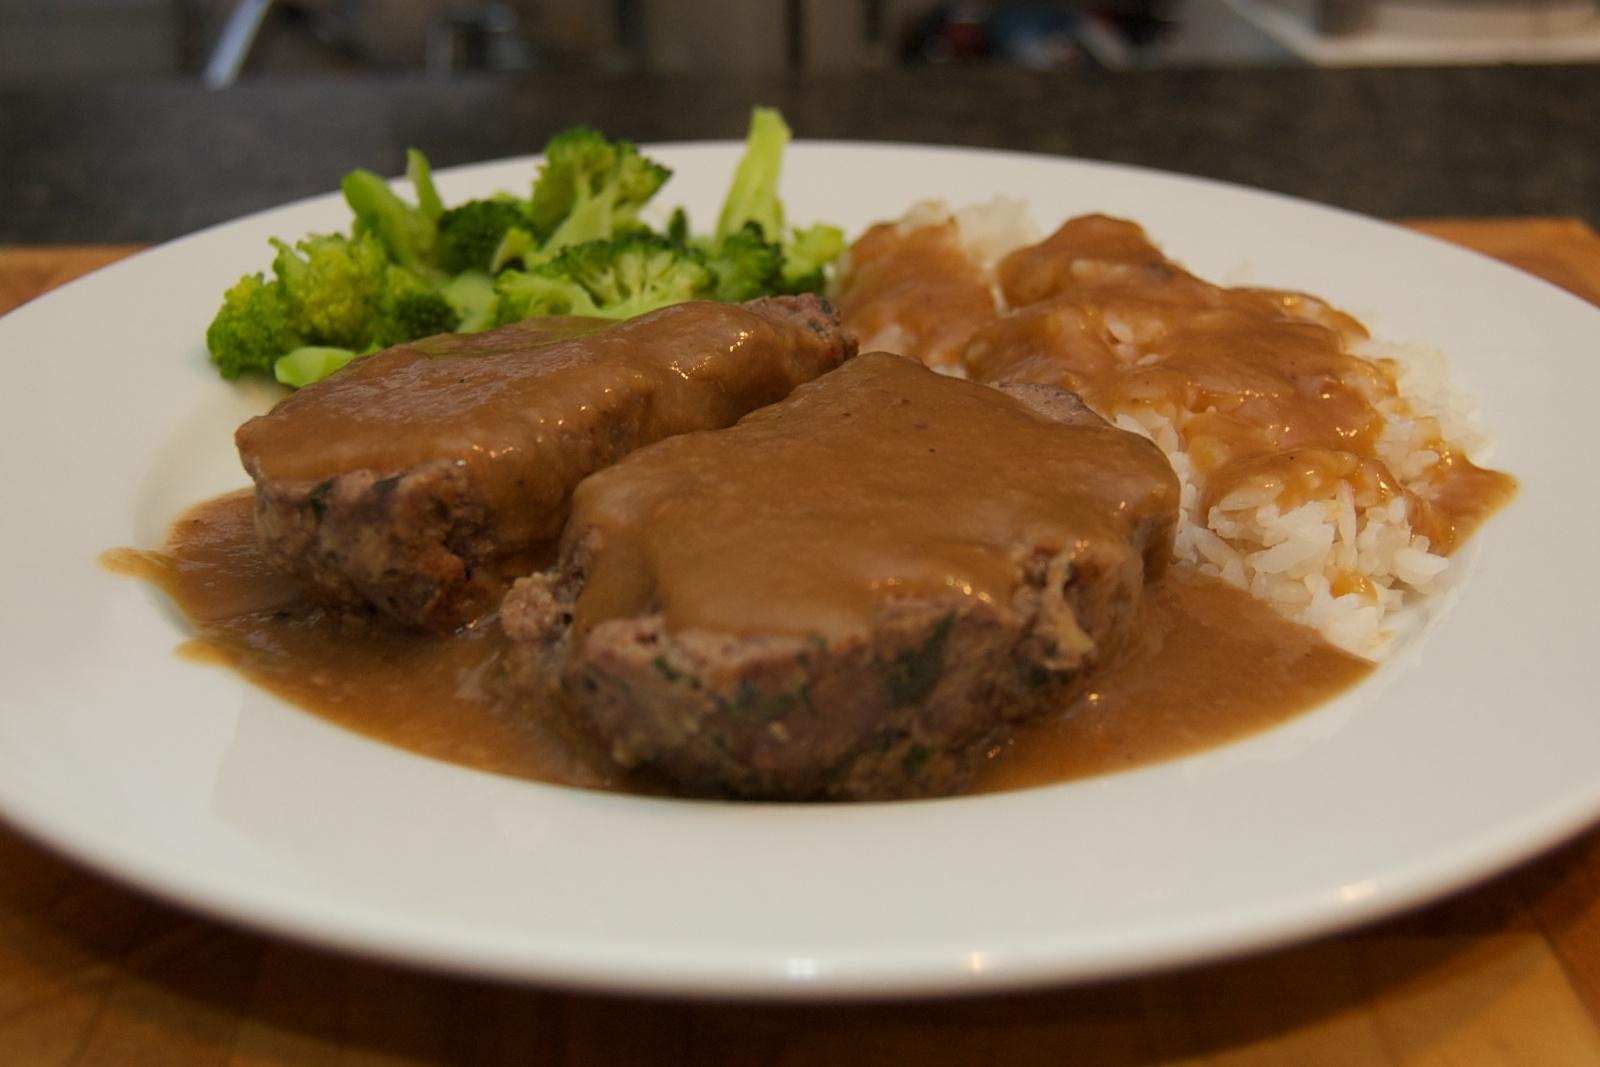 http://blog.rickk.com/food/2010/12/30/ate.20101230.d.jpg